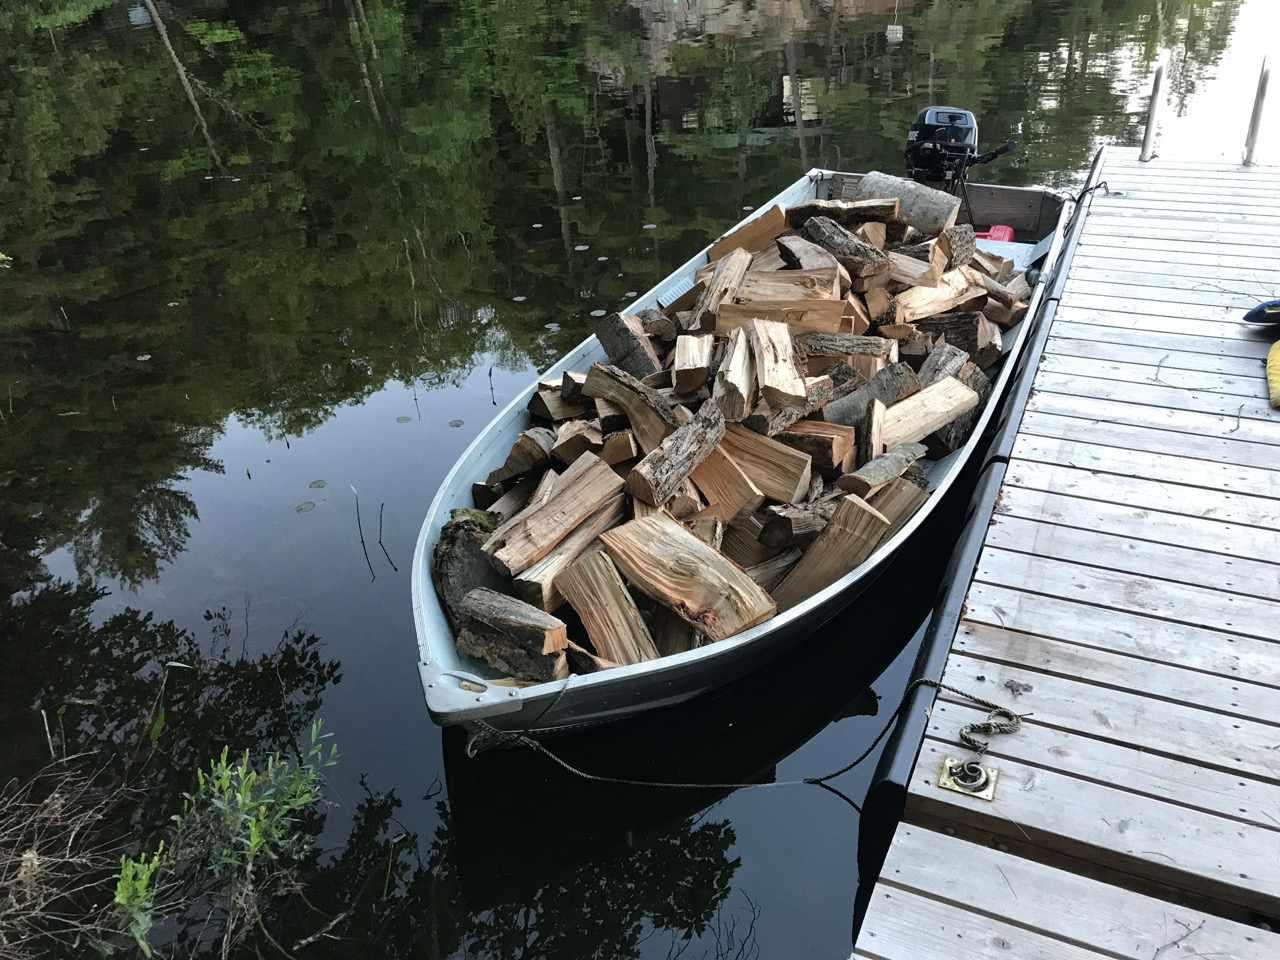 Lloyd Alter's boat full of firewood